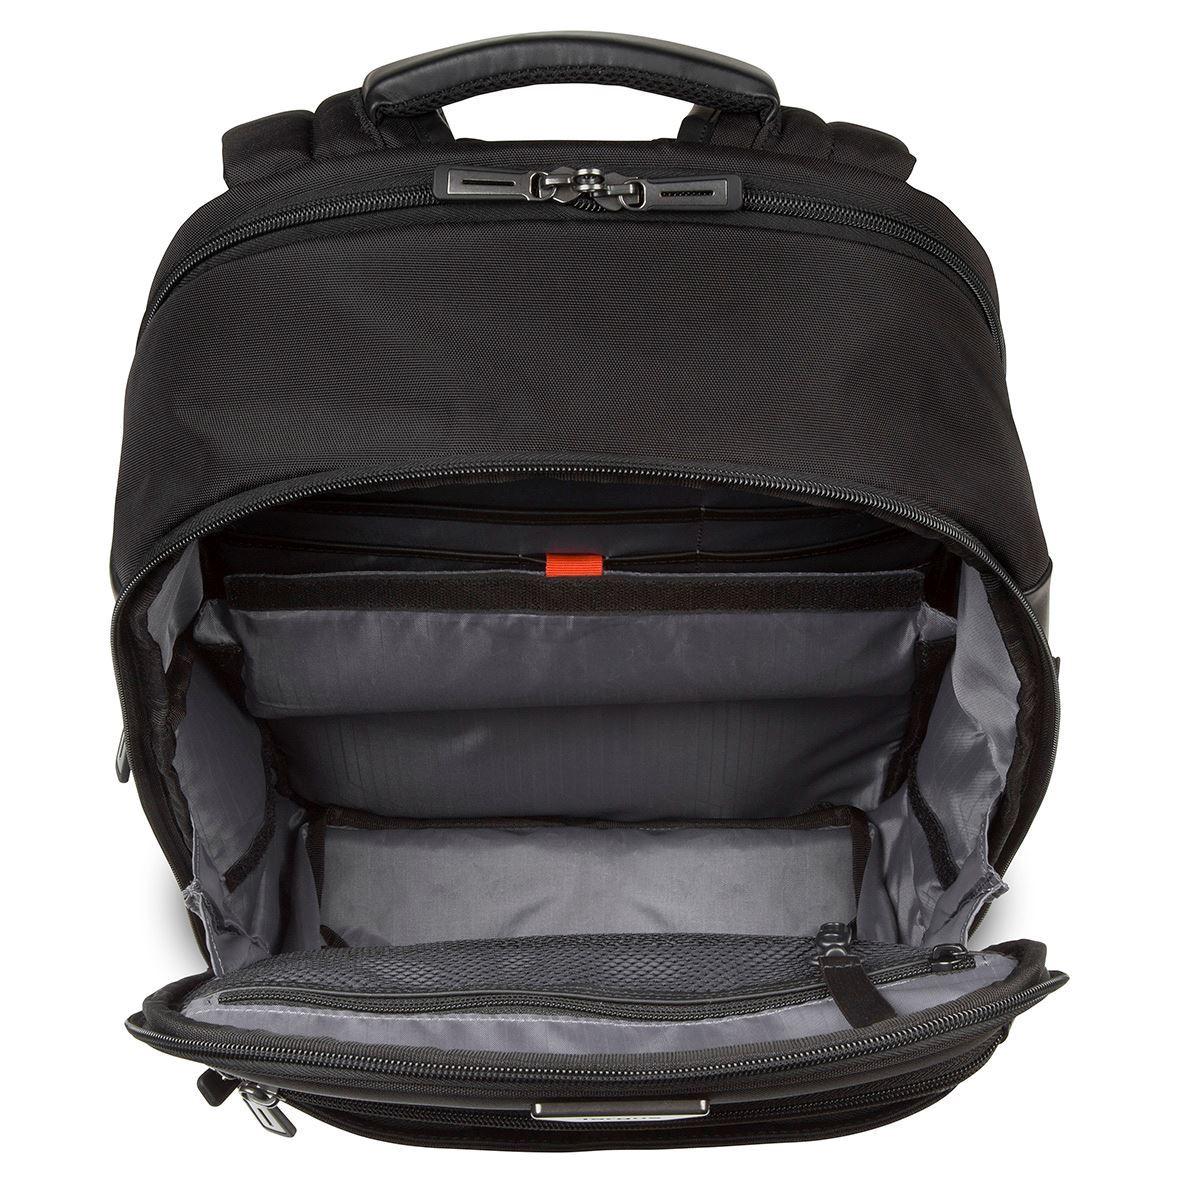 0027810 mobile-vip-12-125-13-133-14-15-156-large-laptop-backpack-black.jpeg 1b71f1d4f6